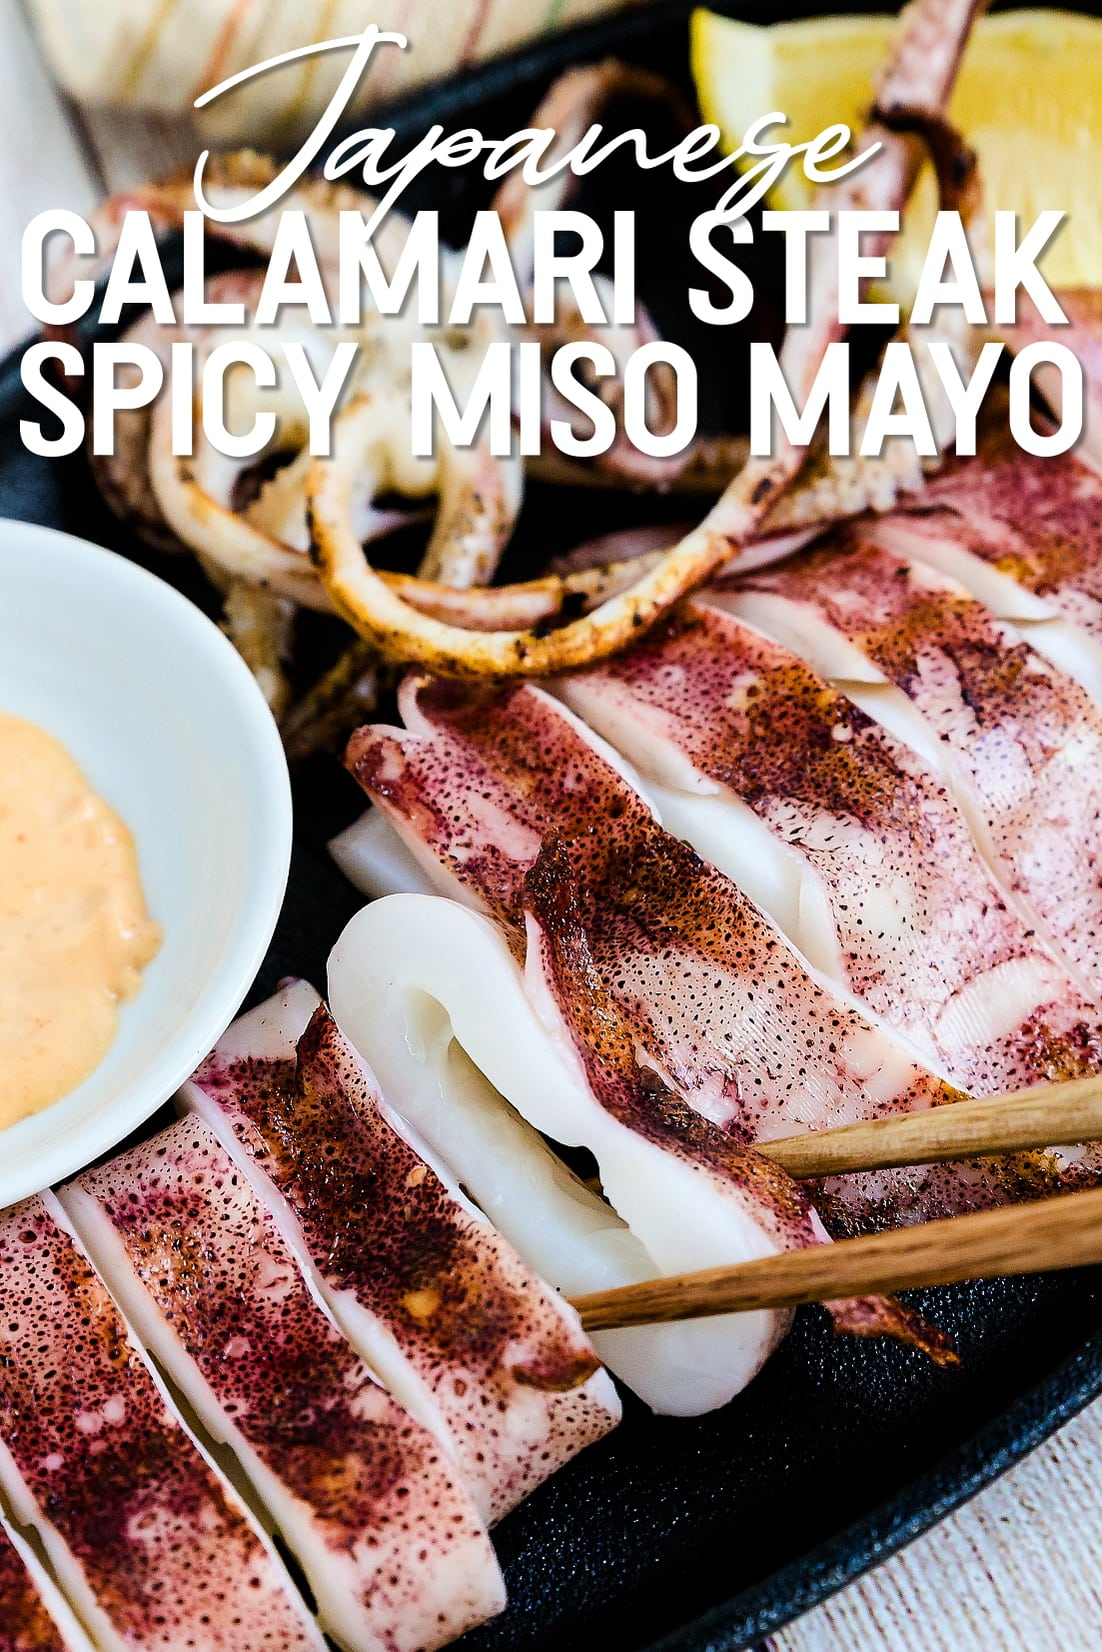 Japanese BBQ Calamari with chopsticks